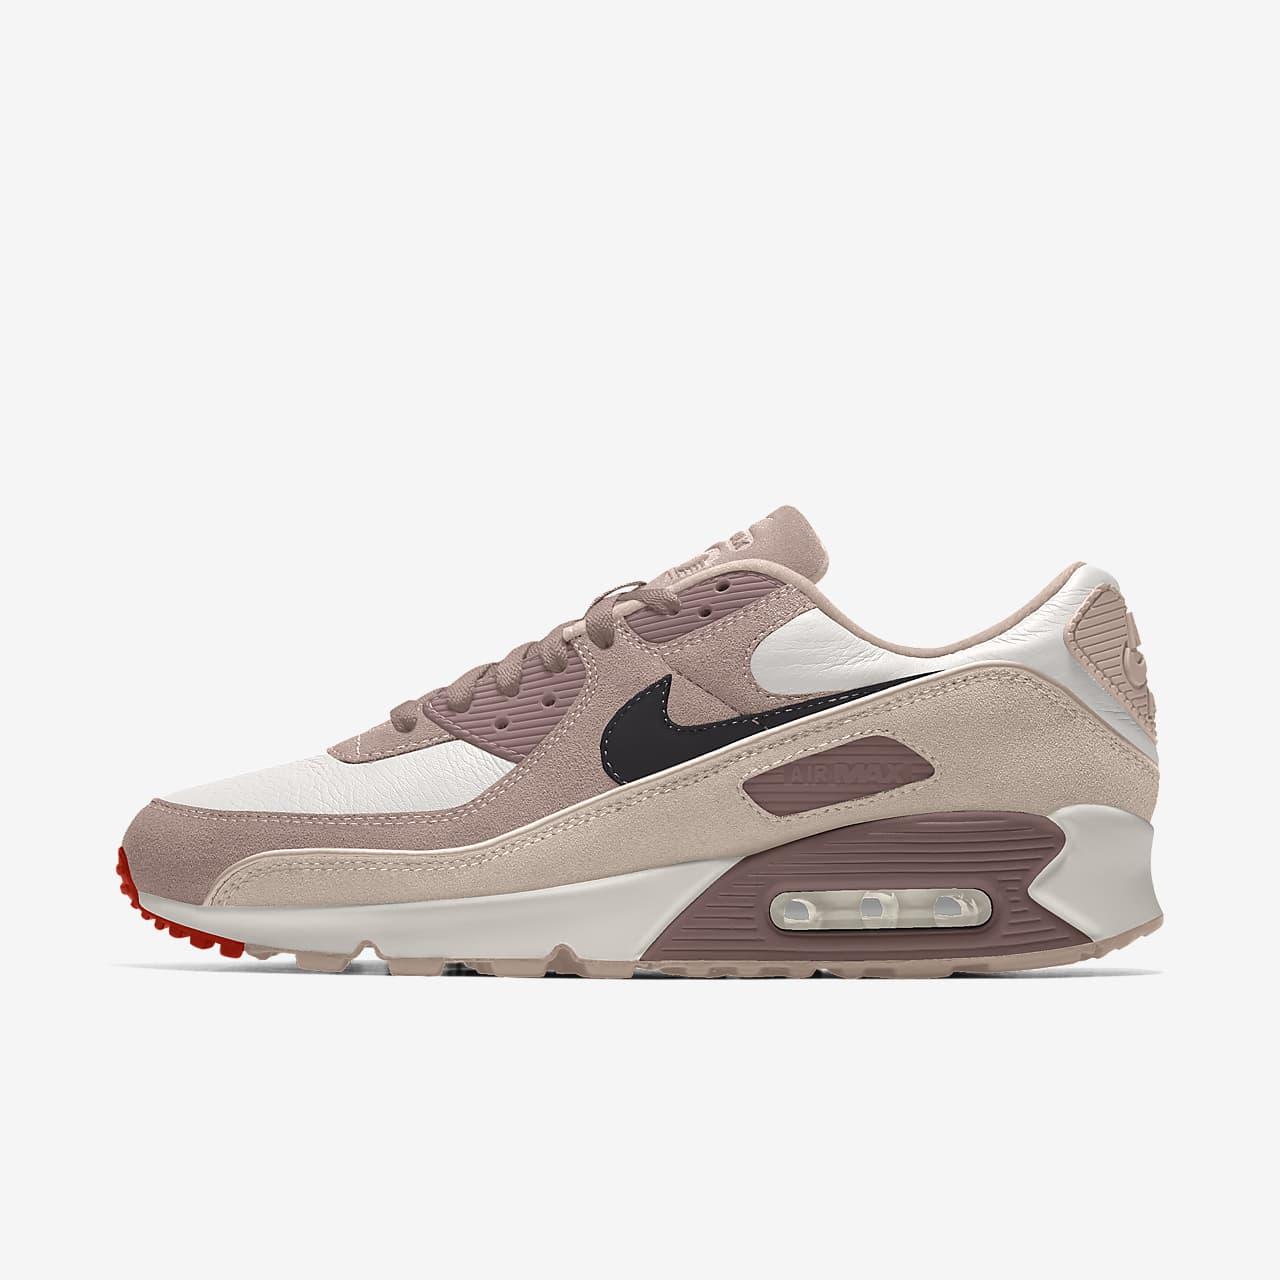 Nike Air Max 90 Unlocked By You Custom Men's Shoe